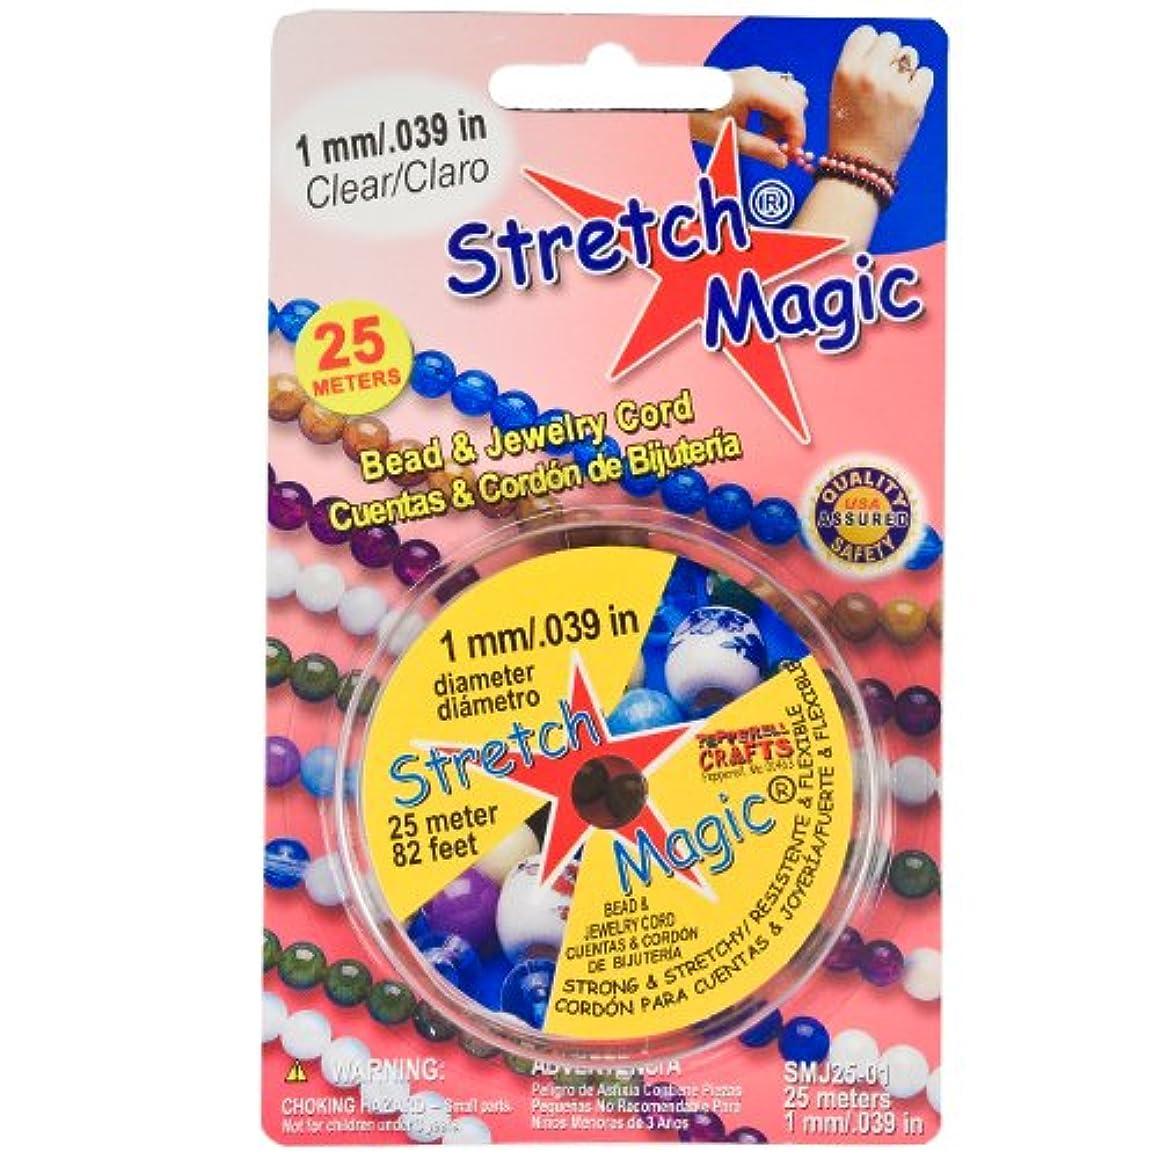 1mm Diameter Stretch Magic Bead Jewelry Elastic Cord Clear or Black in 5 or 25 Meters